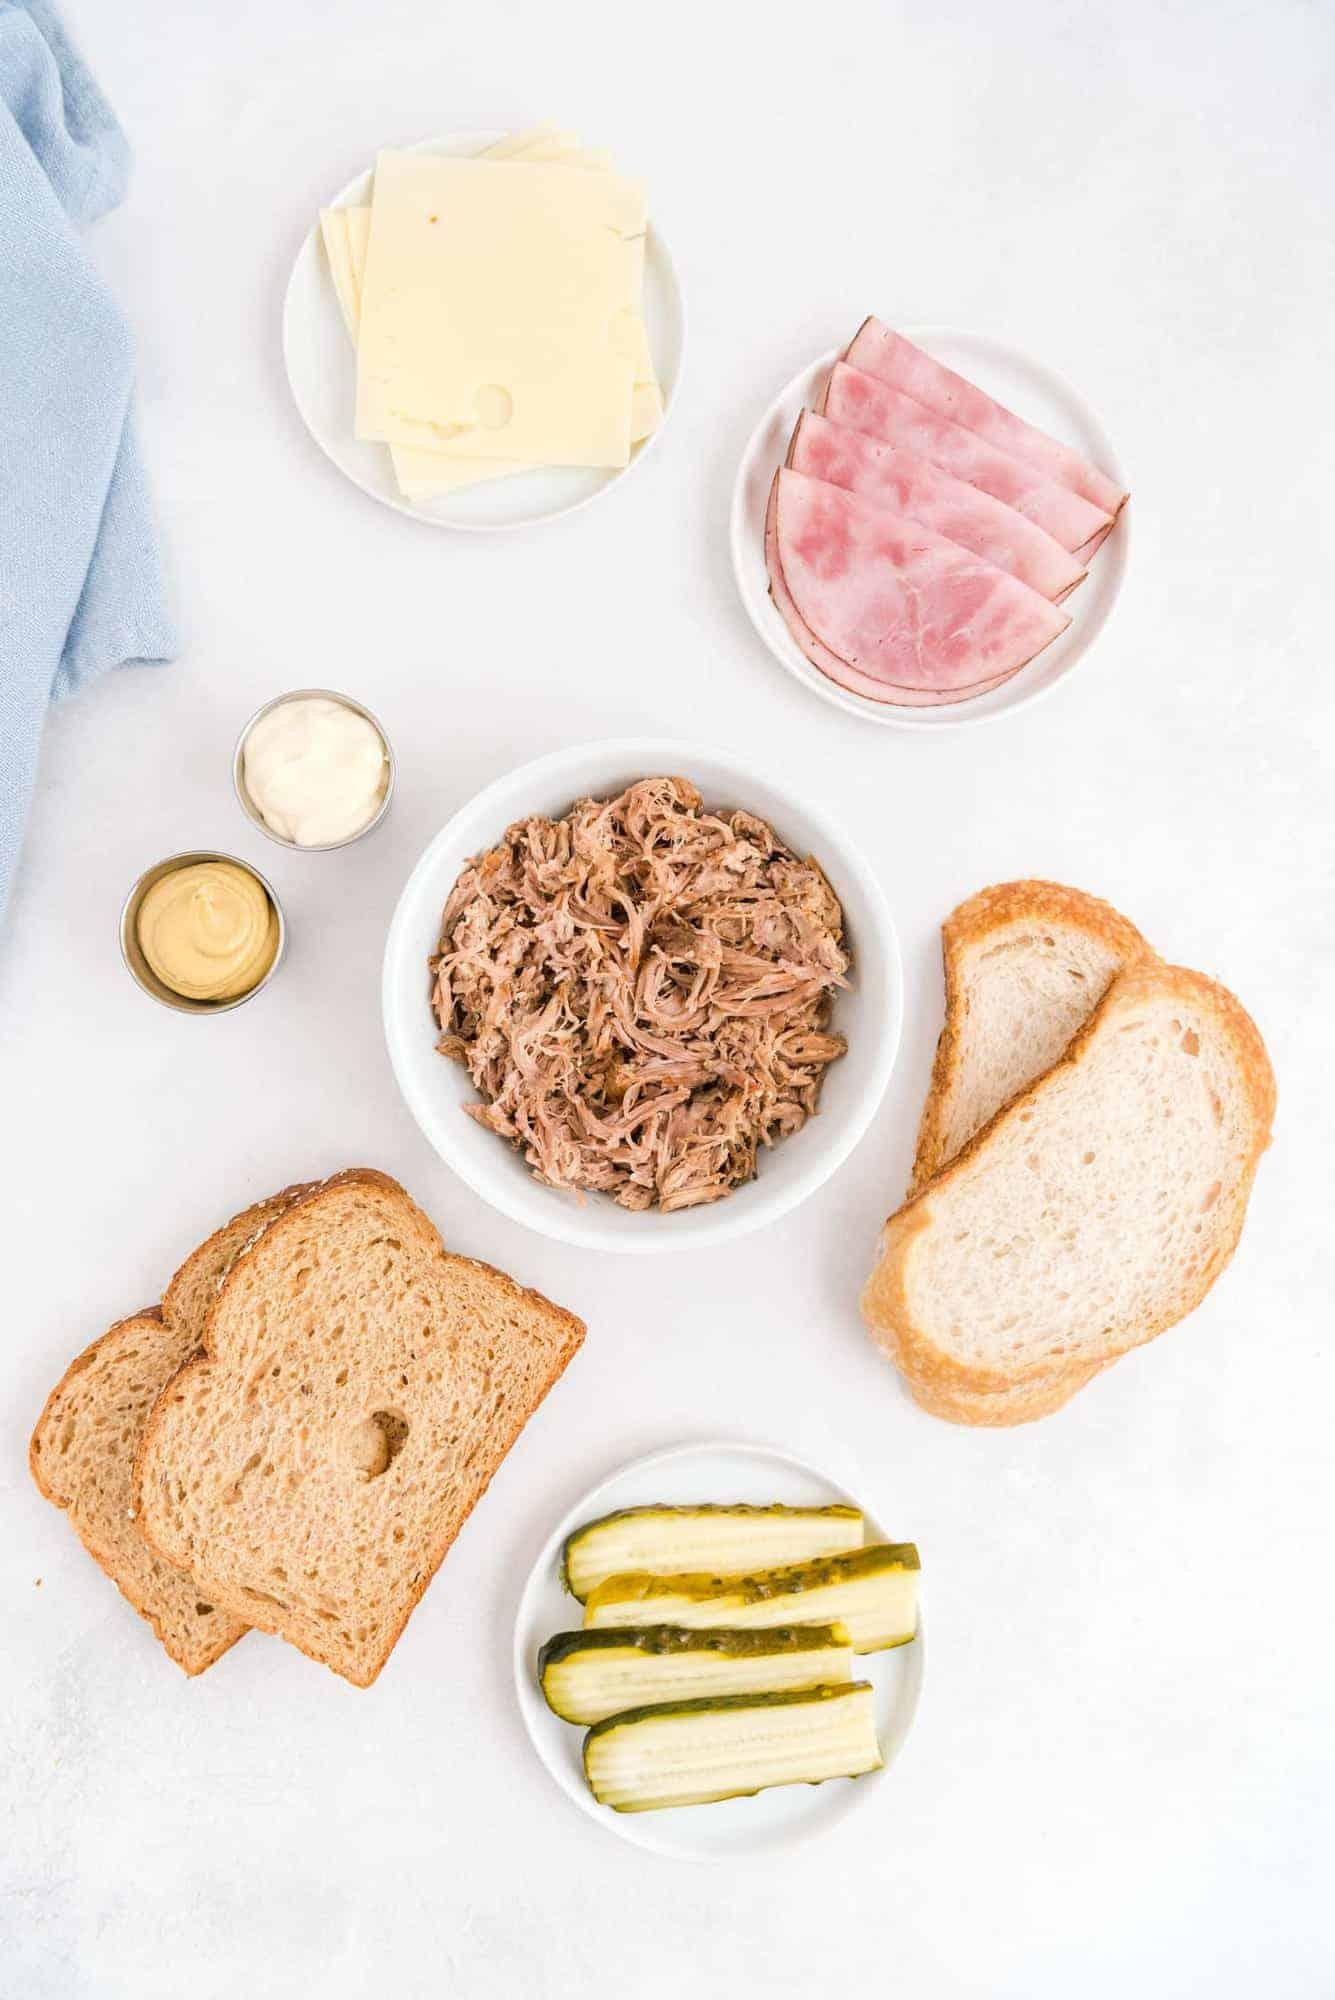 Overhead view of ingredients: pork, ham, pickles, bread, mustard, mayo, cheese.